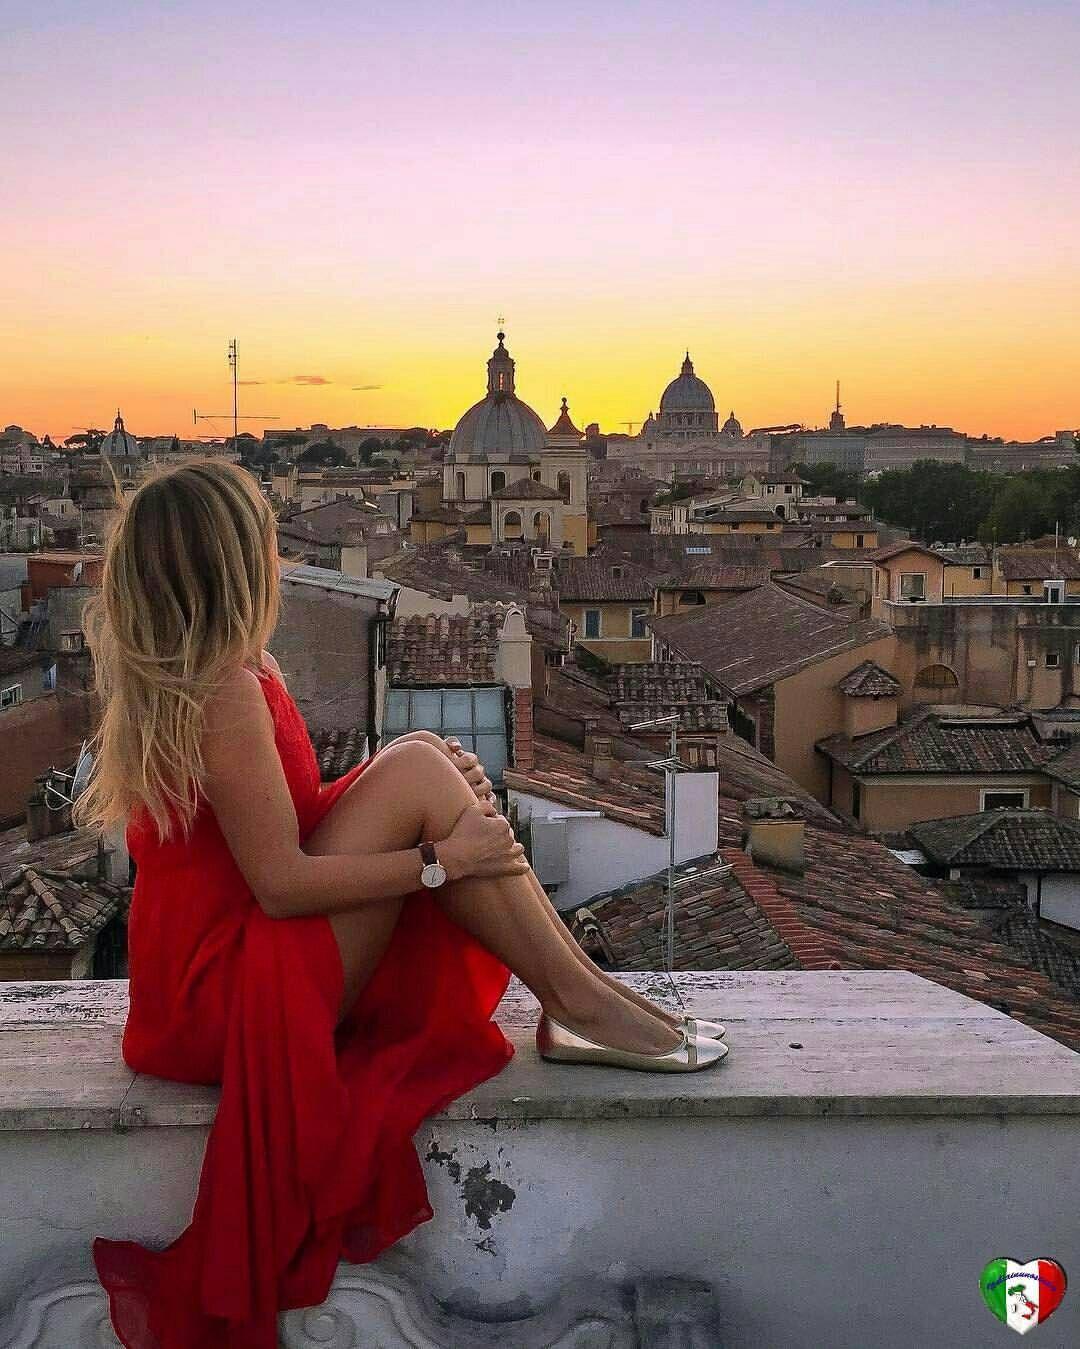 : Roma, Lazio, Italy